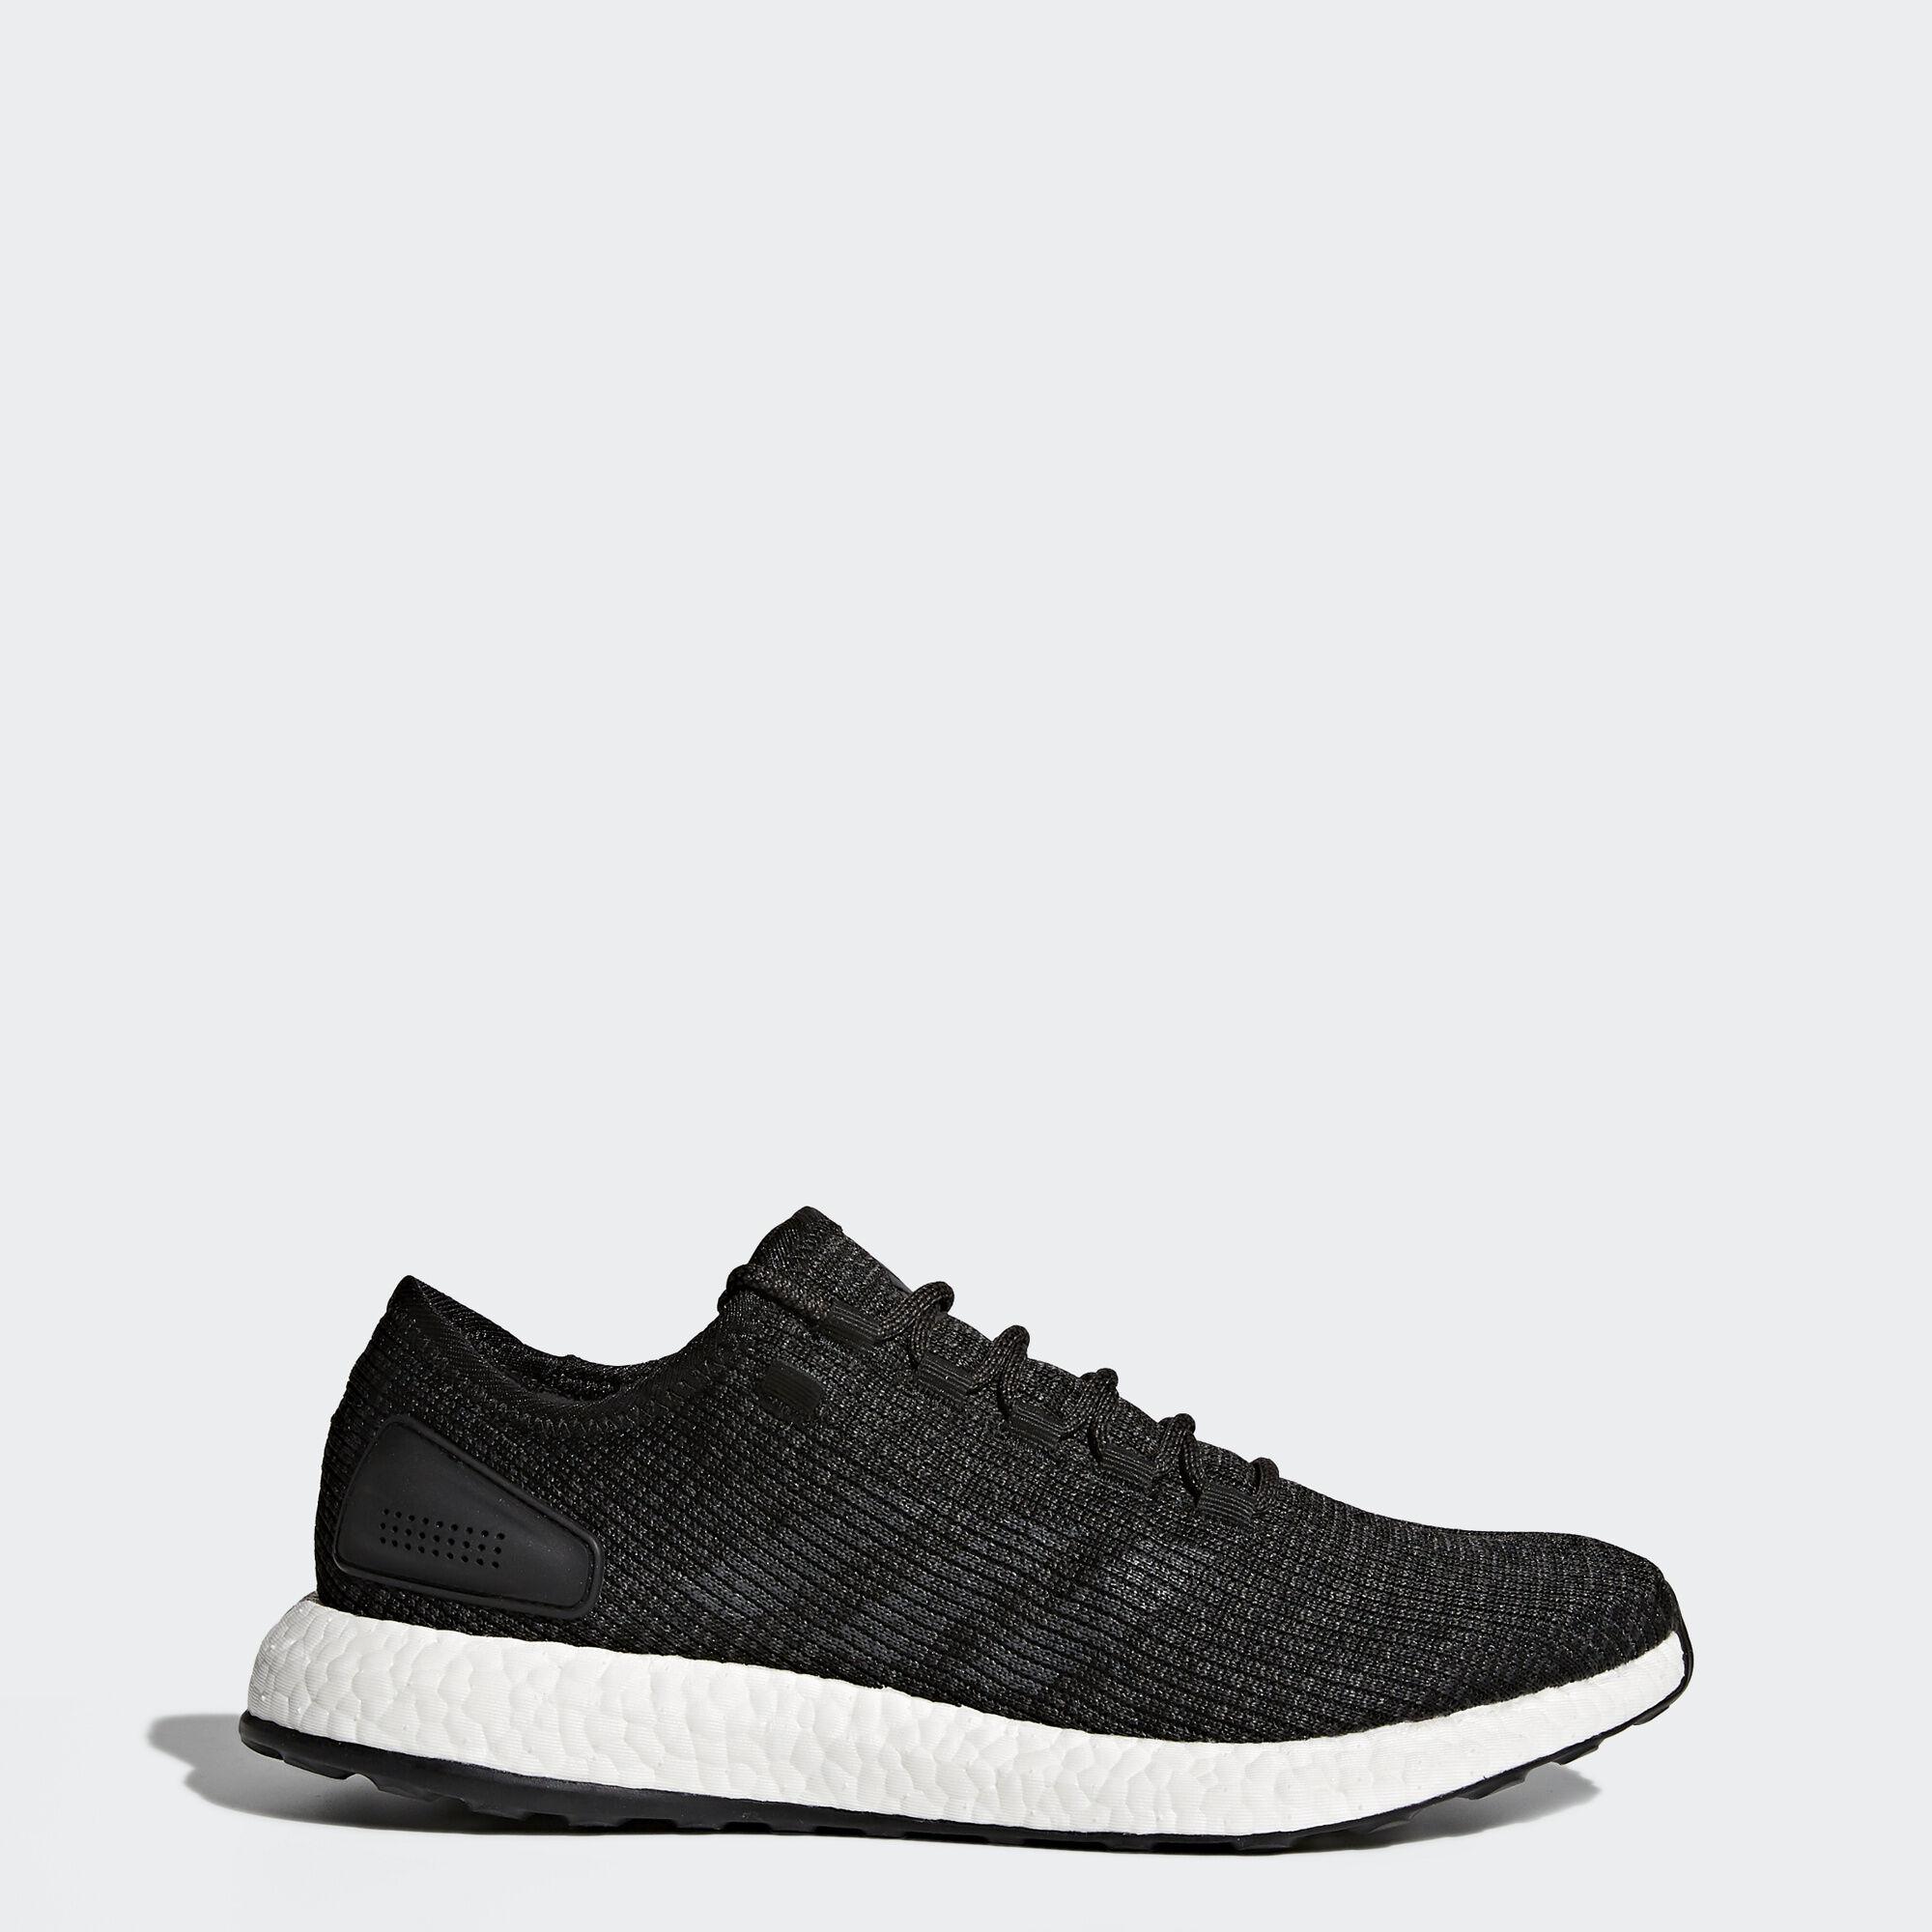 Adidas Boost Shoes Grey